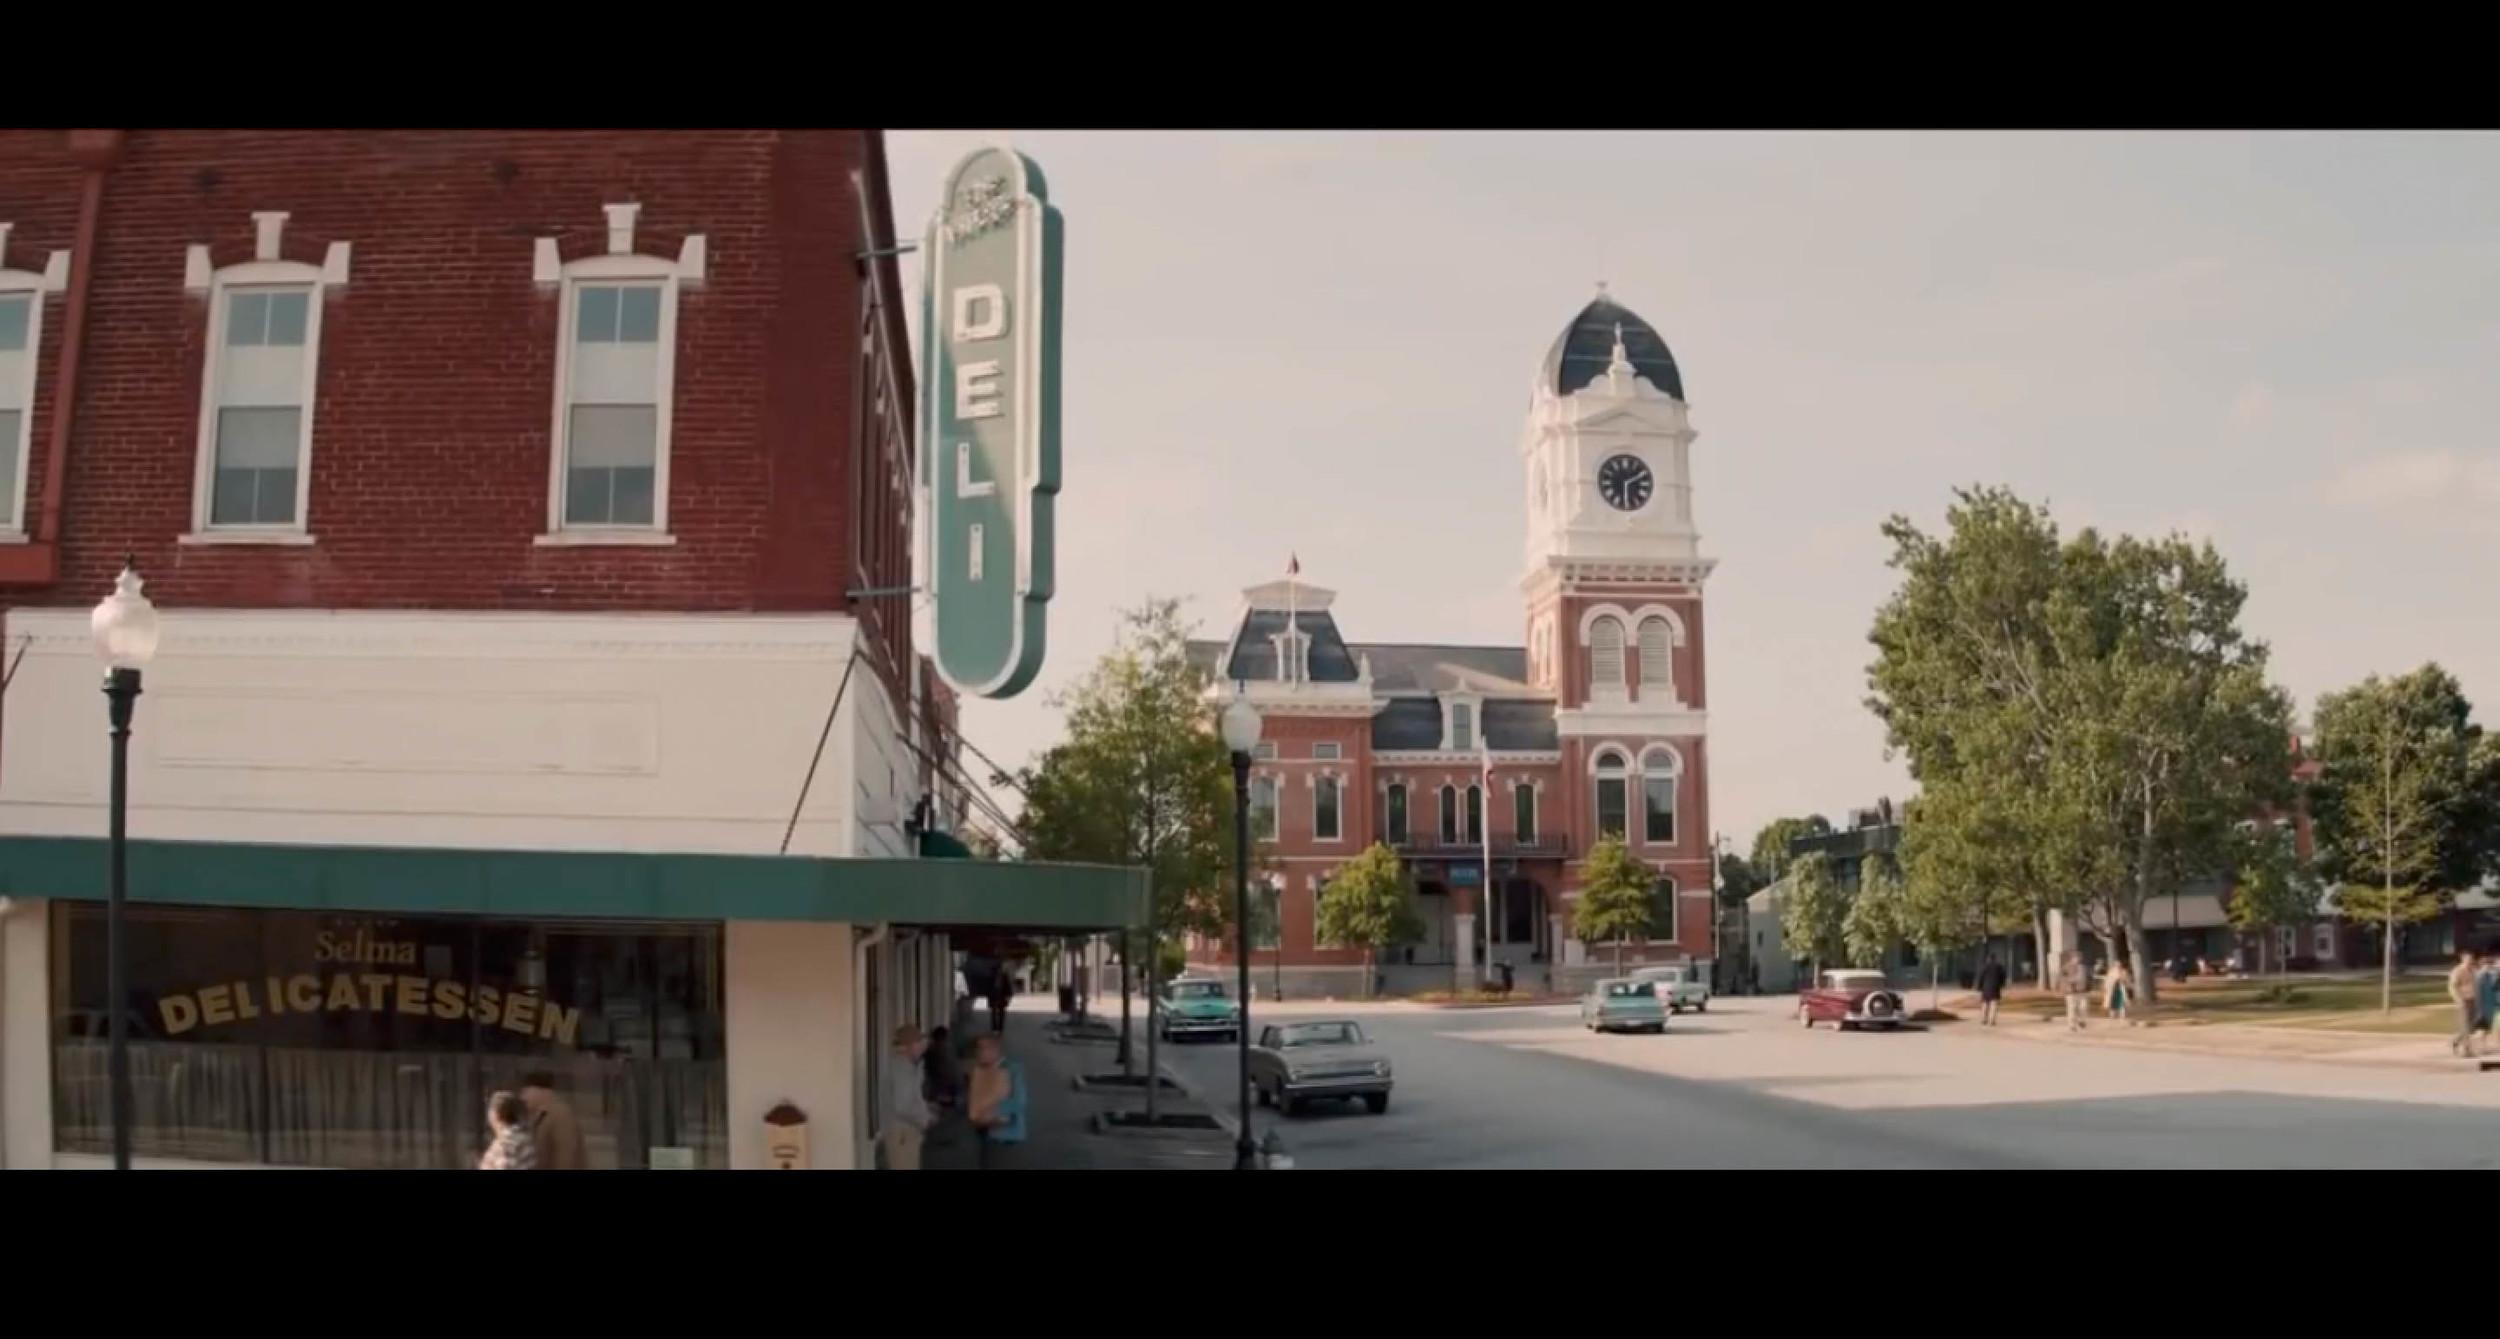 Screenshotof  Selma  - though the actual film location might be in Covington, Georgia.